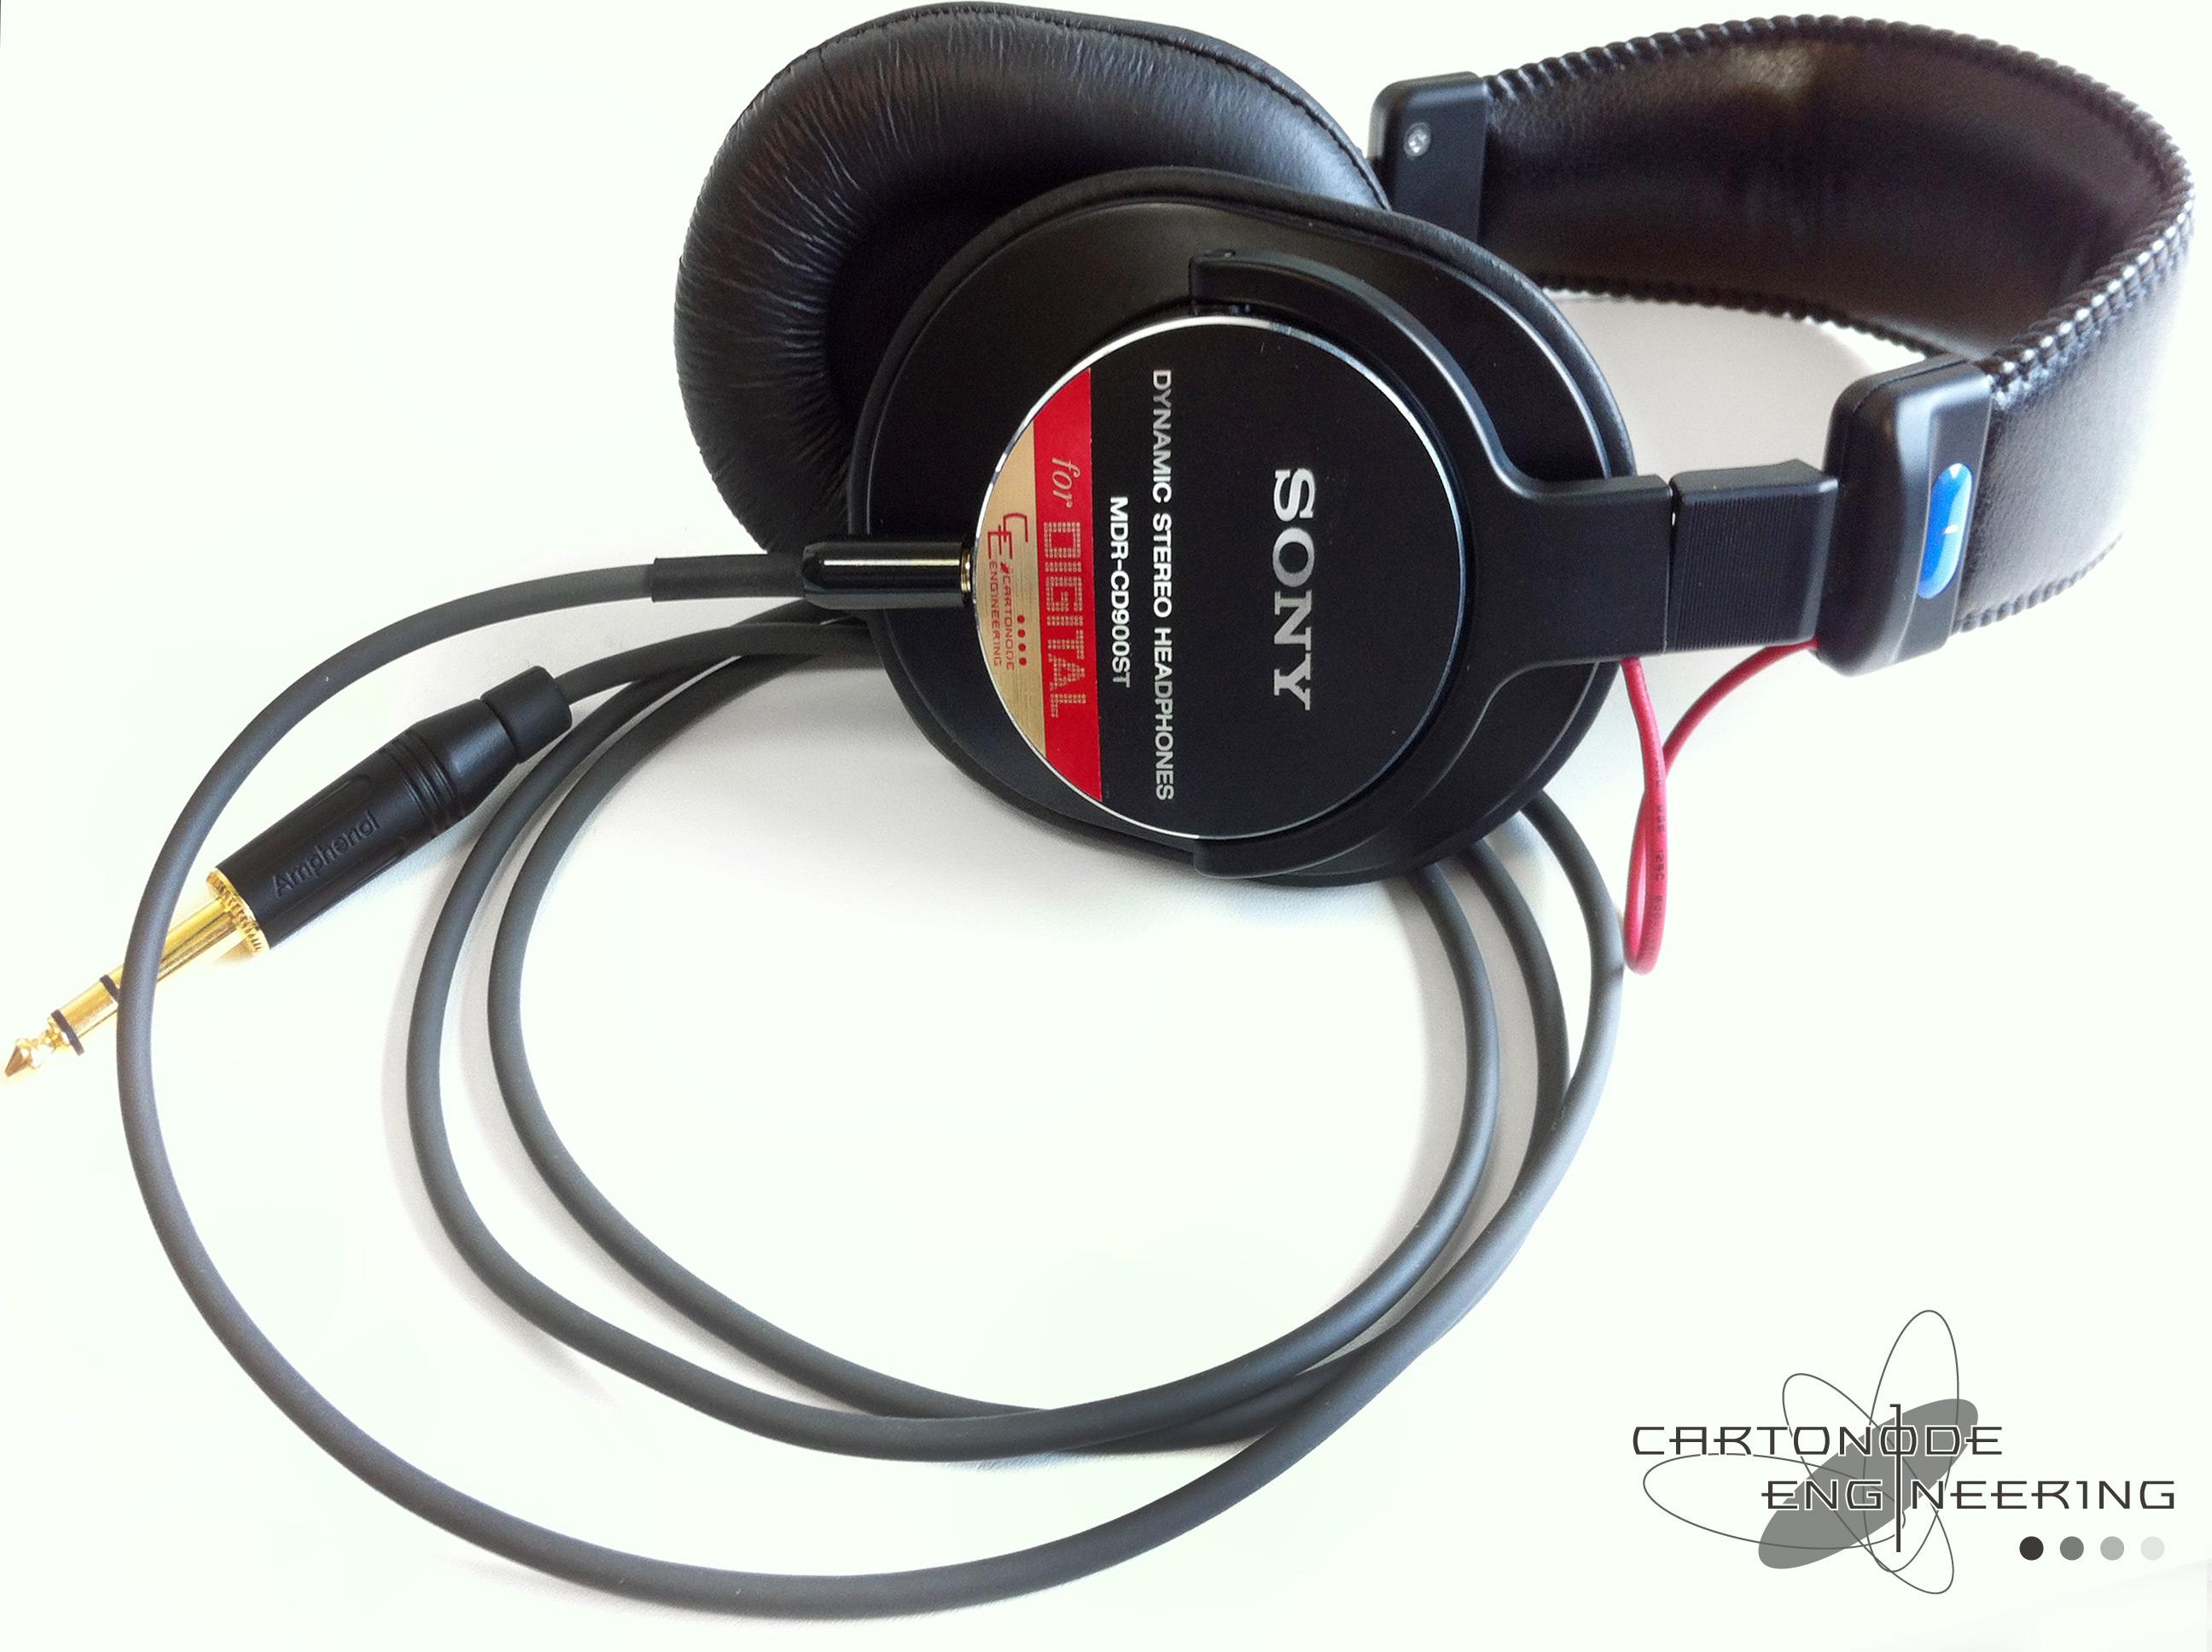 CE-MDR-CD900STmodバランス脱着